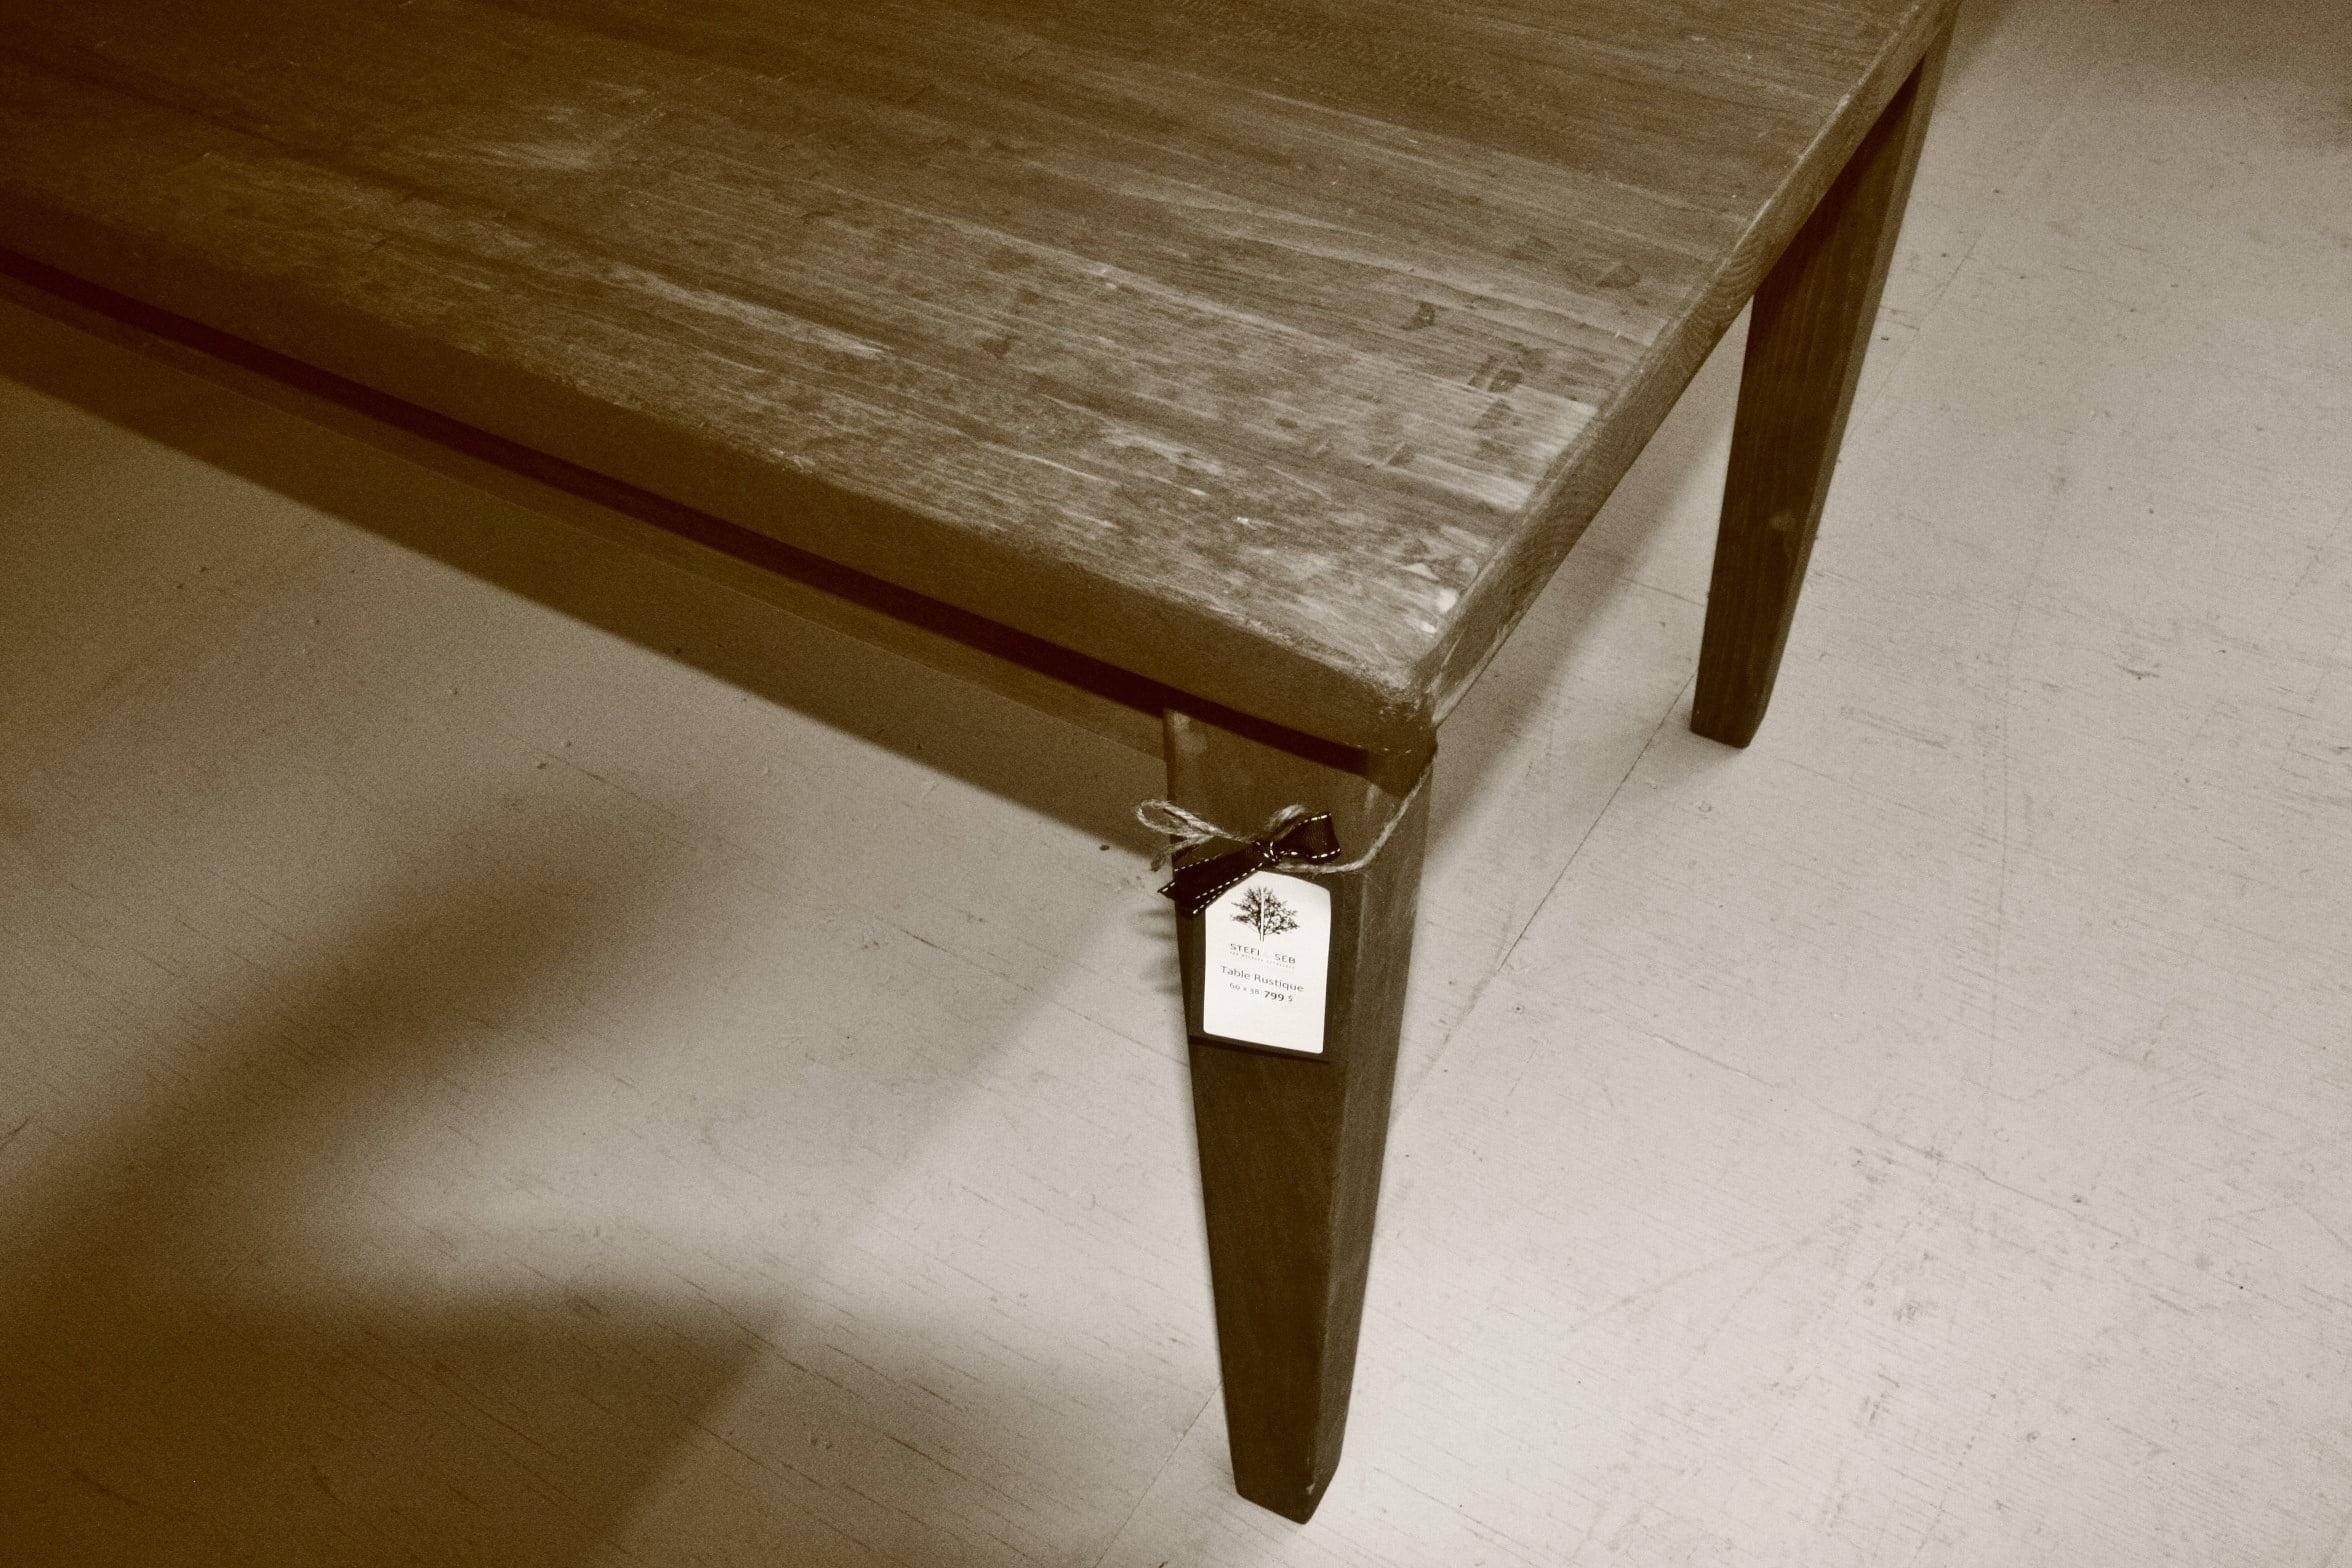 Table la rustique 3 meubles sur mesure meubles hochelaga for Meuble hochelaga montreal